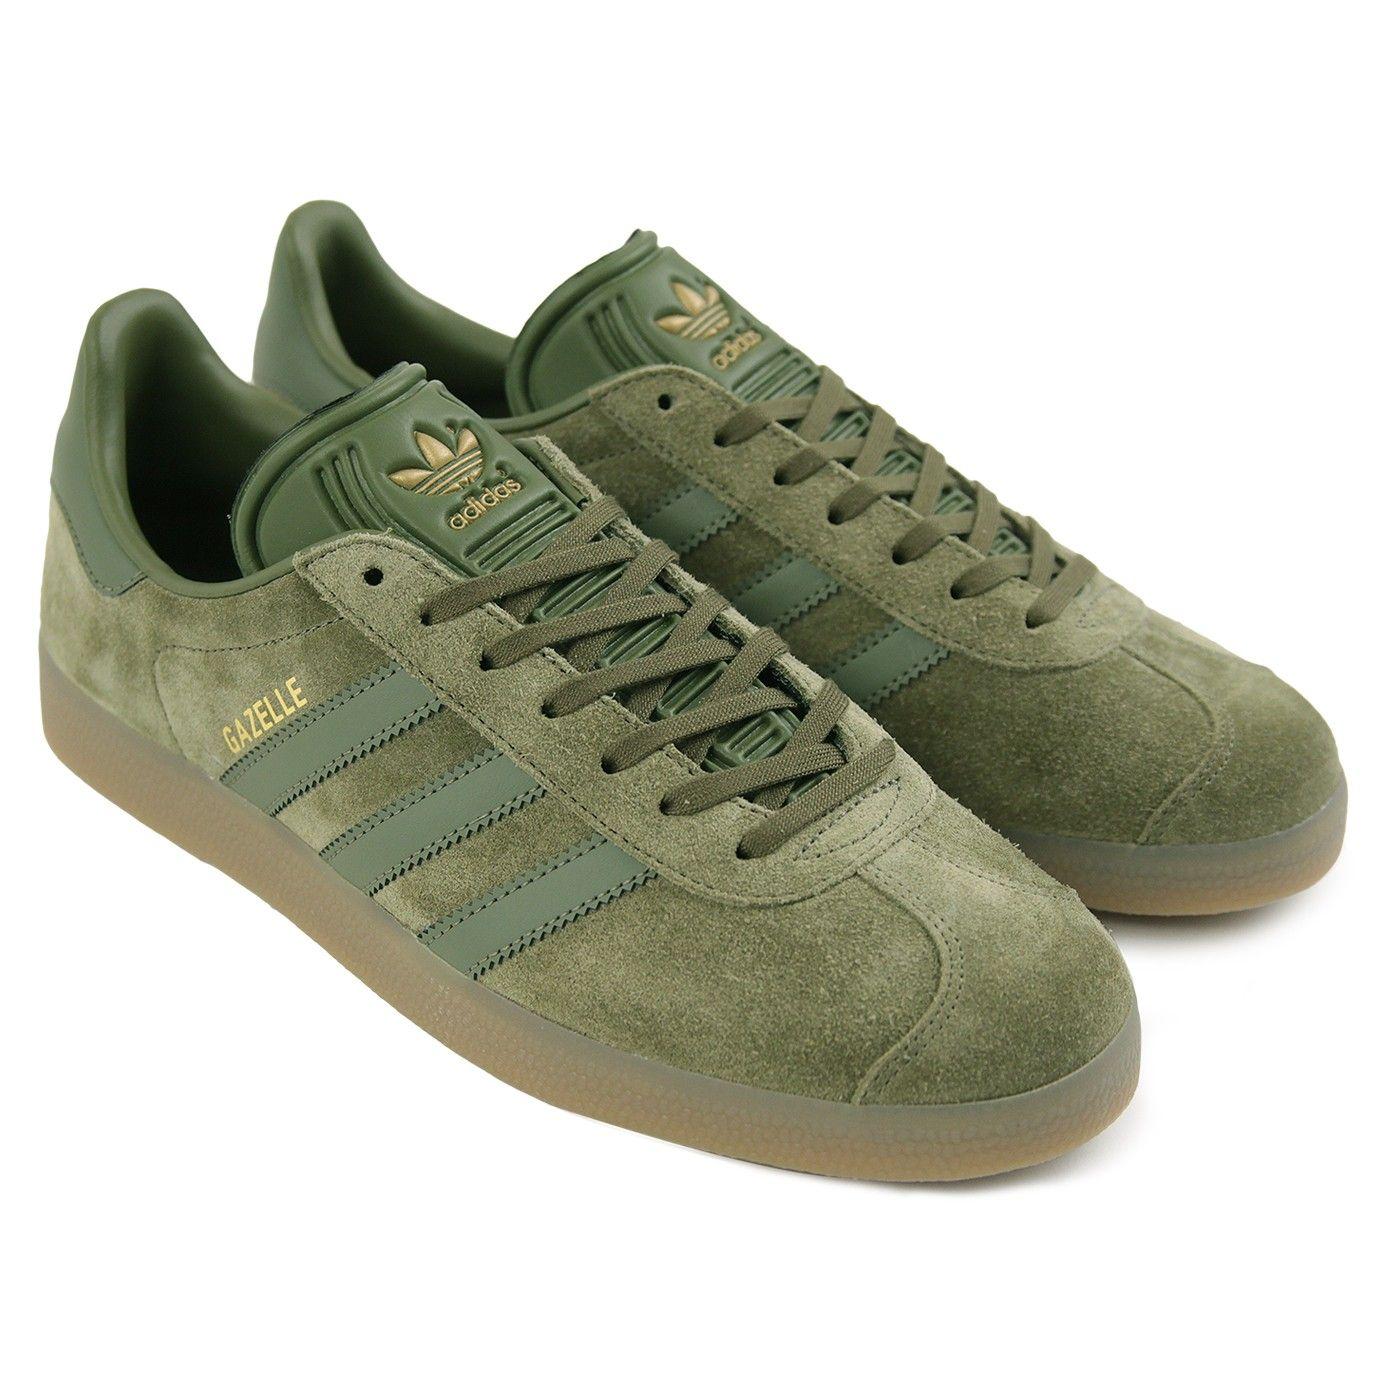 Zapatos gacela en OLIVA OLIVA OLIVA de carga carga / Adidas / / Gum 4 por